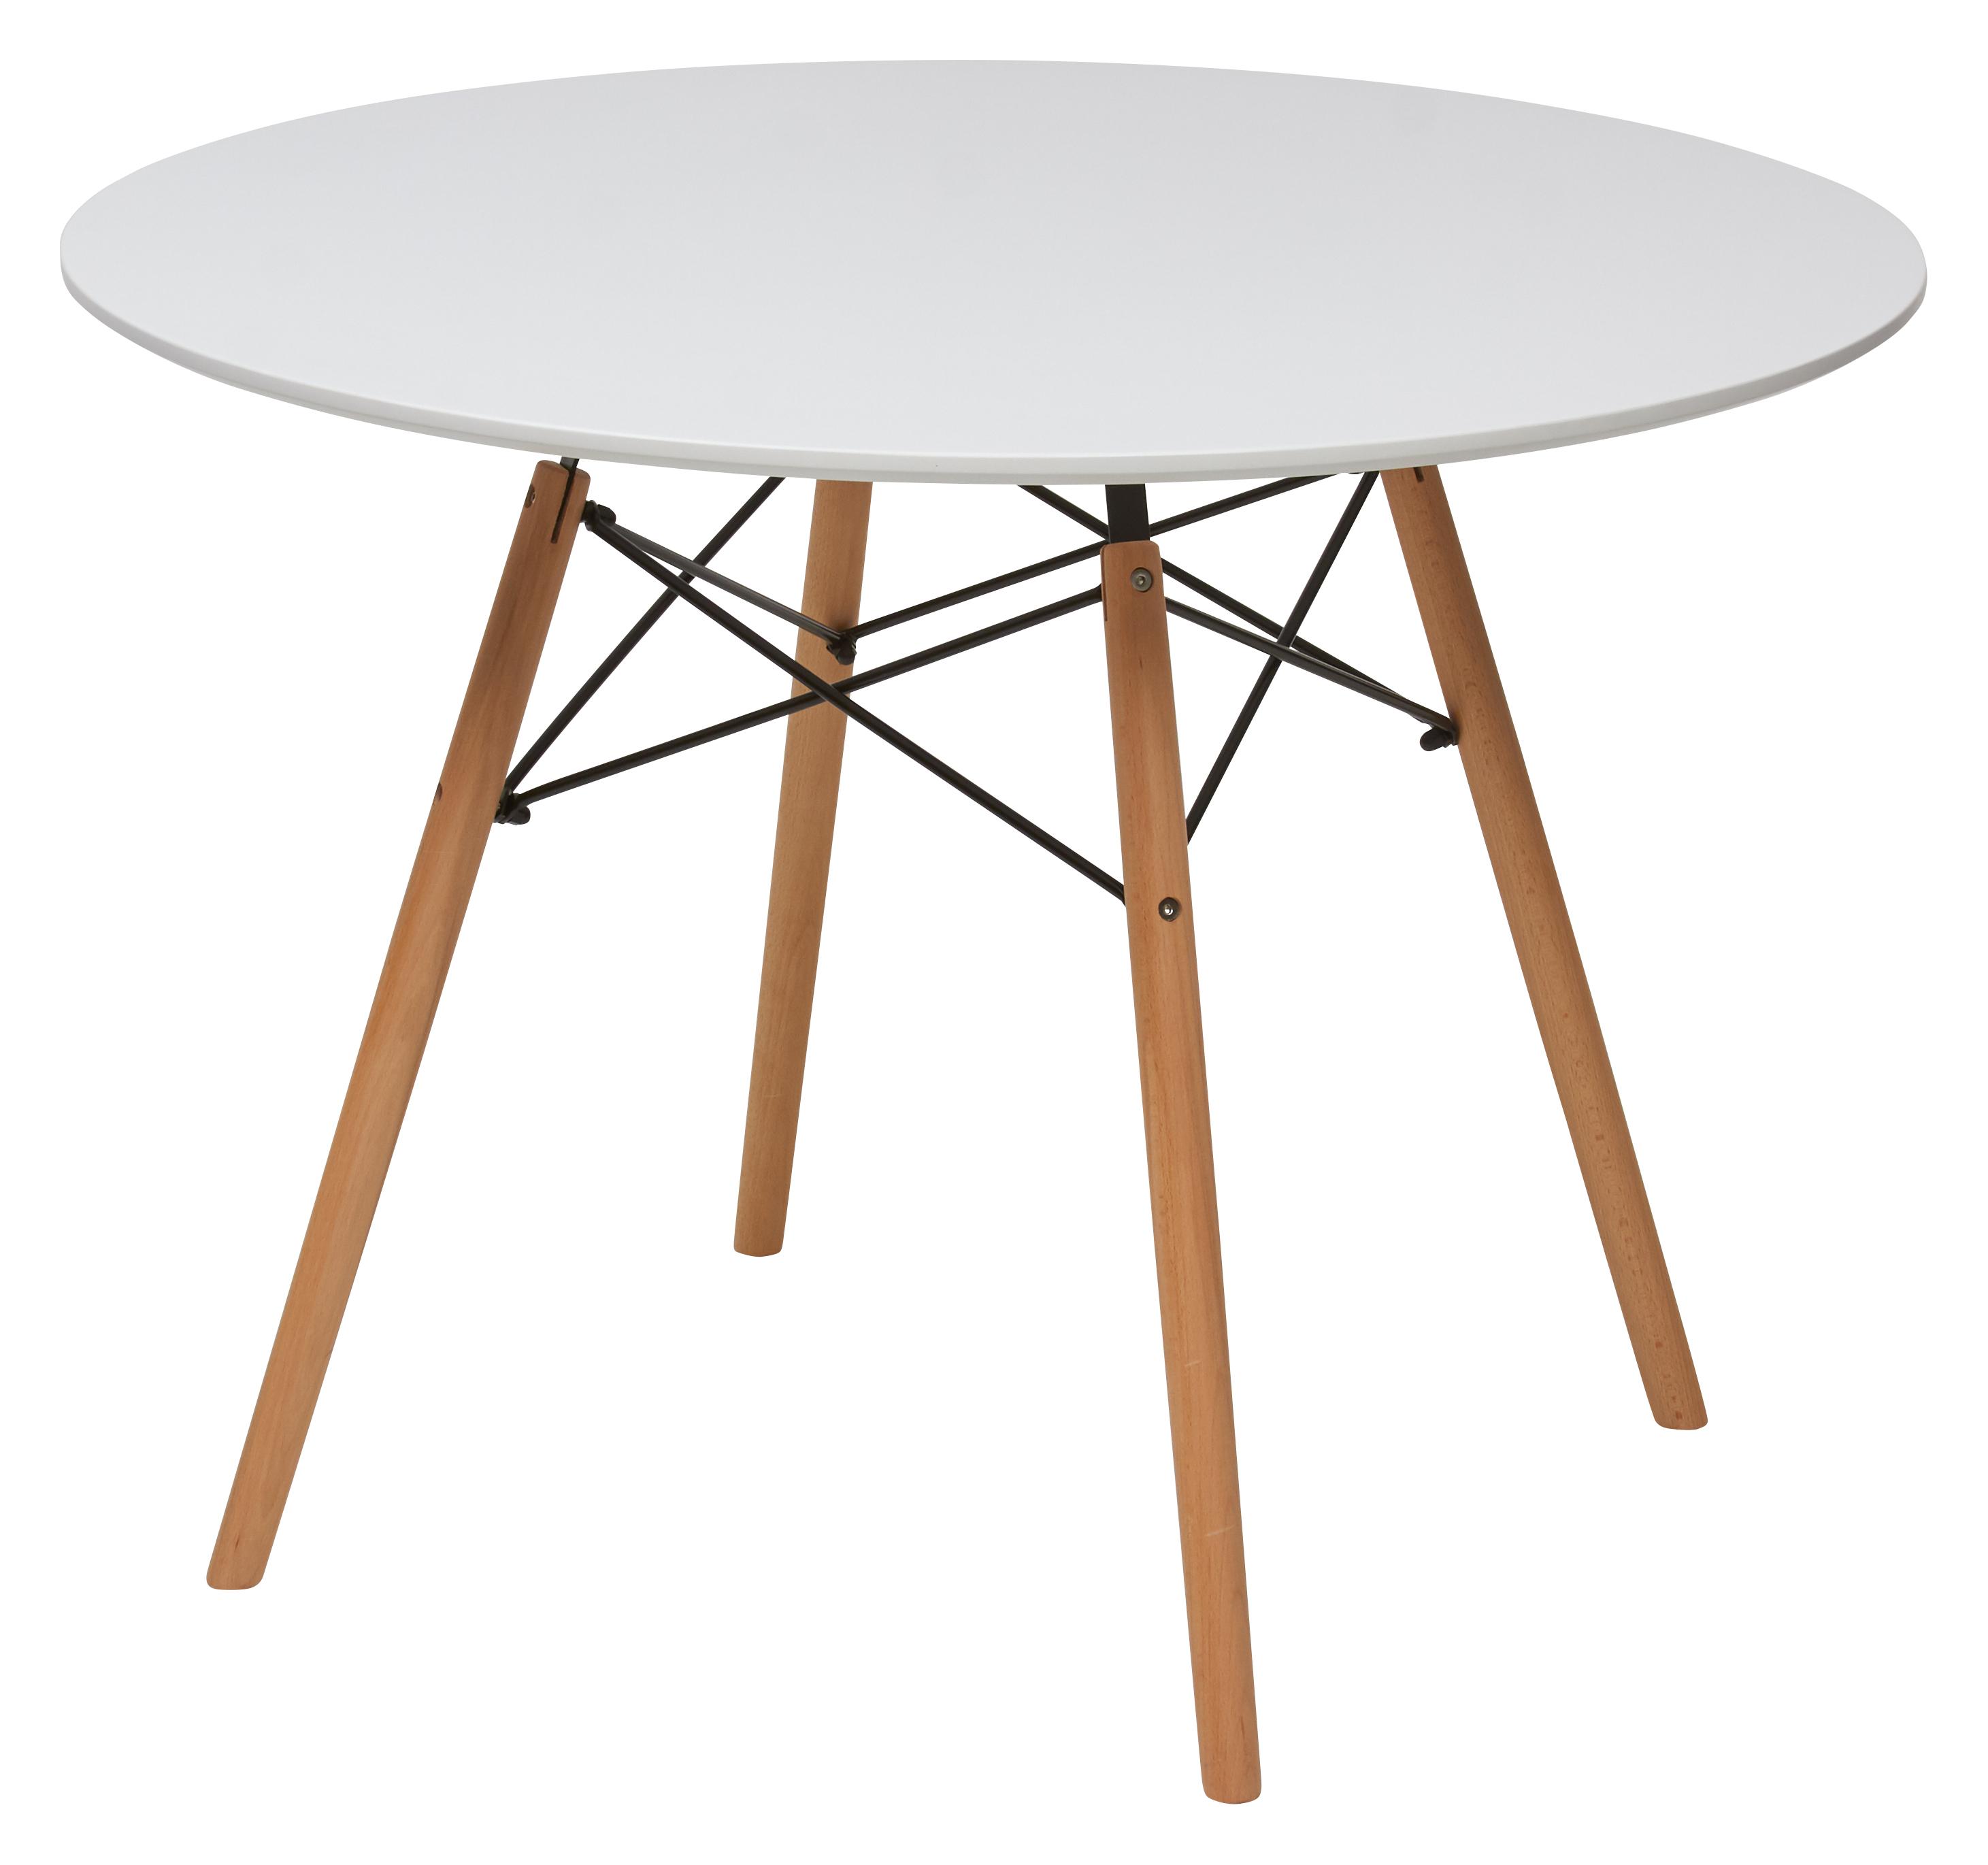 Сноудроп Стол на деревянном каркасе Д80, Д90, Д100